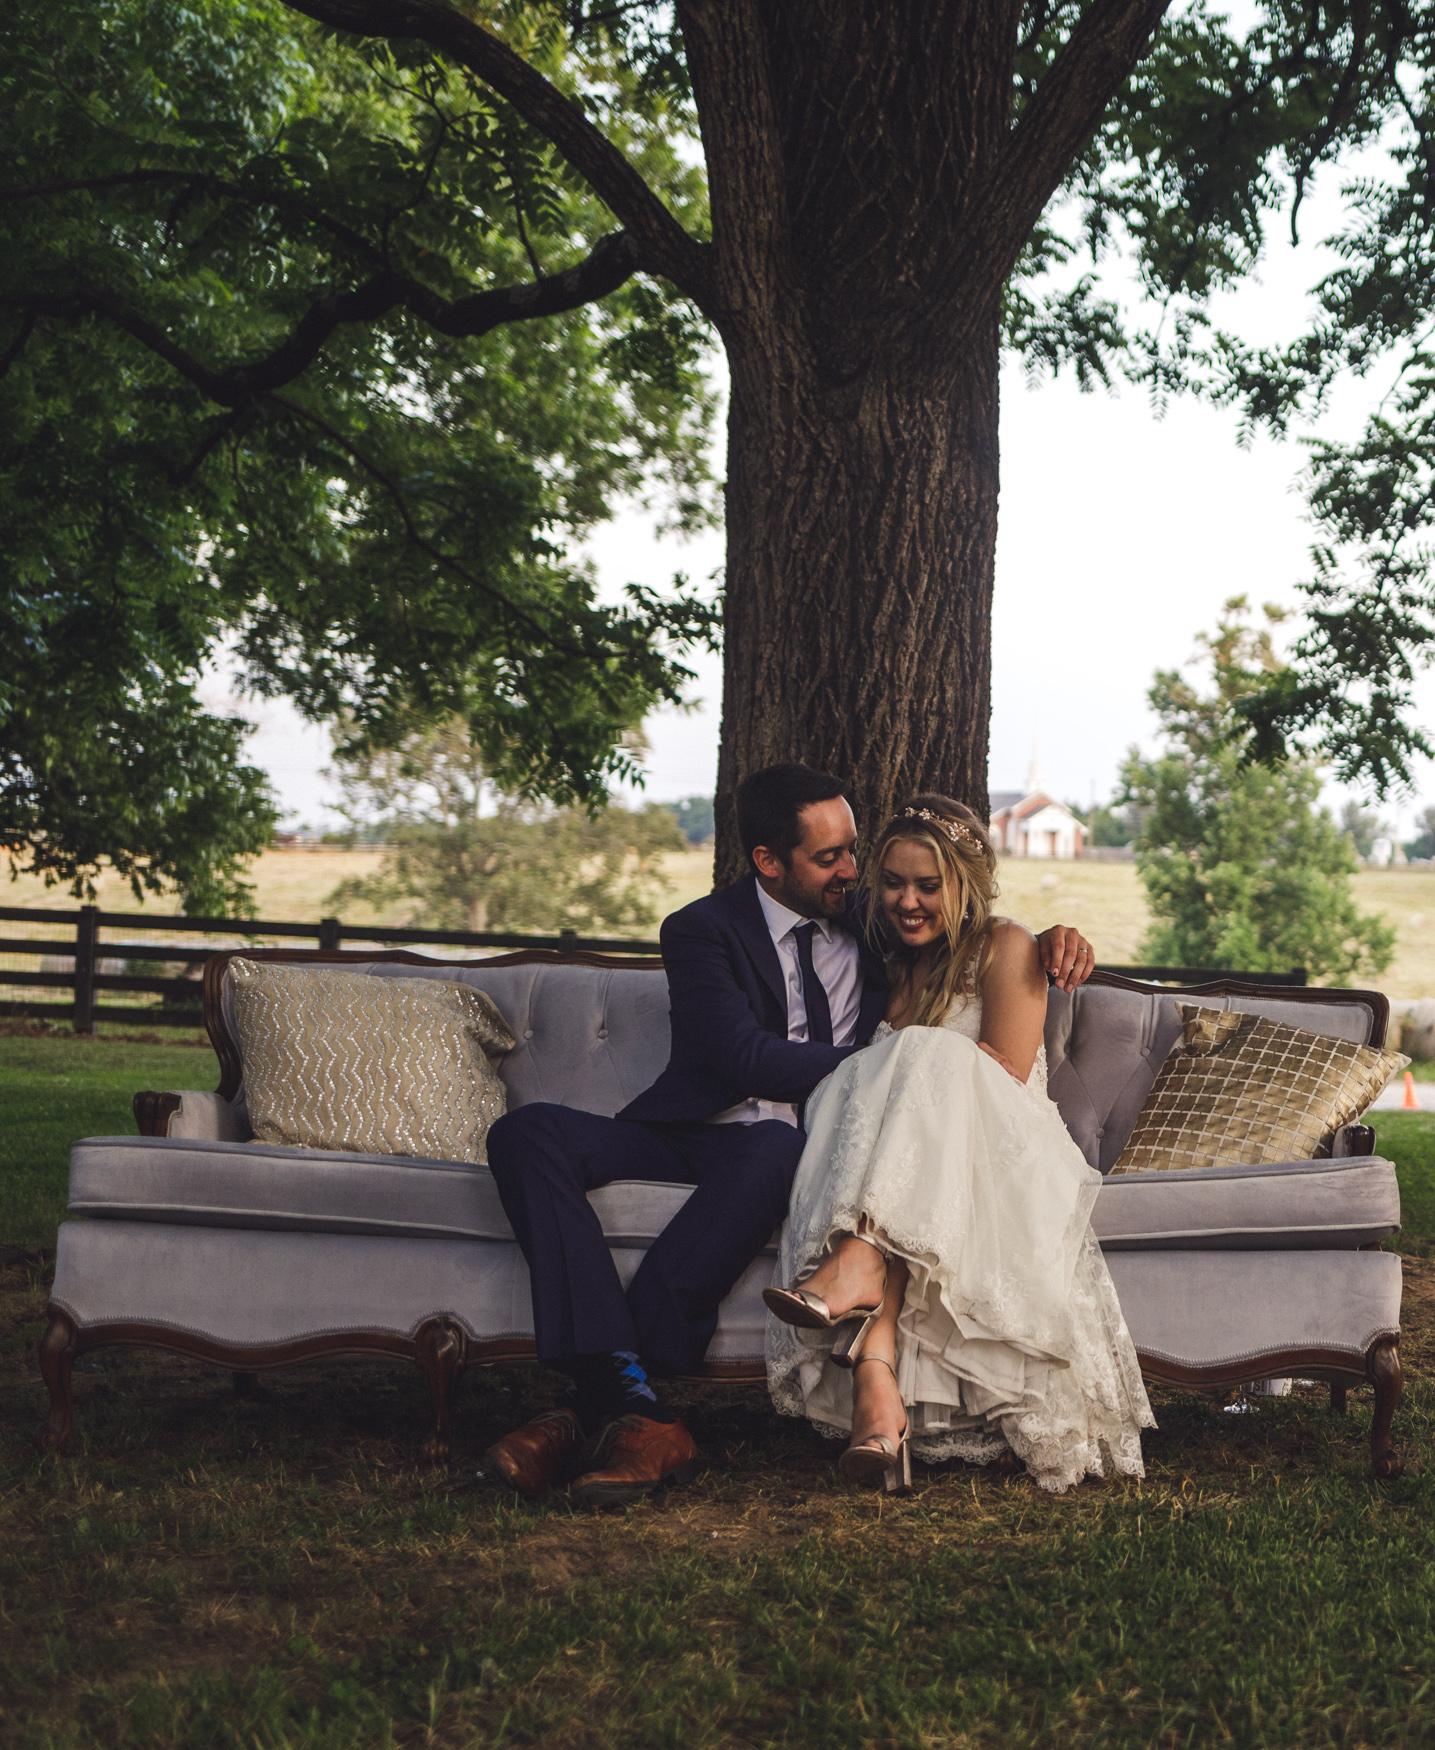 ogletree estates wedding, destination wedding photographer, wedding photographer georgia, charlotte wedding photographer, nyc wedding photographer,